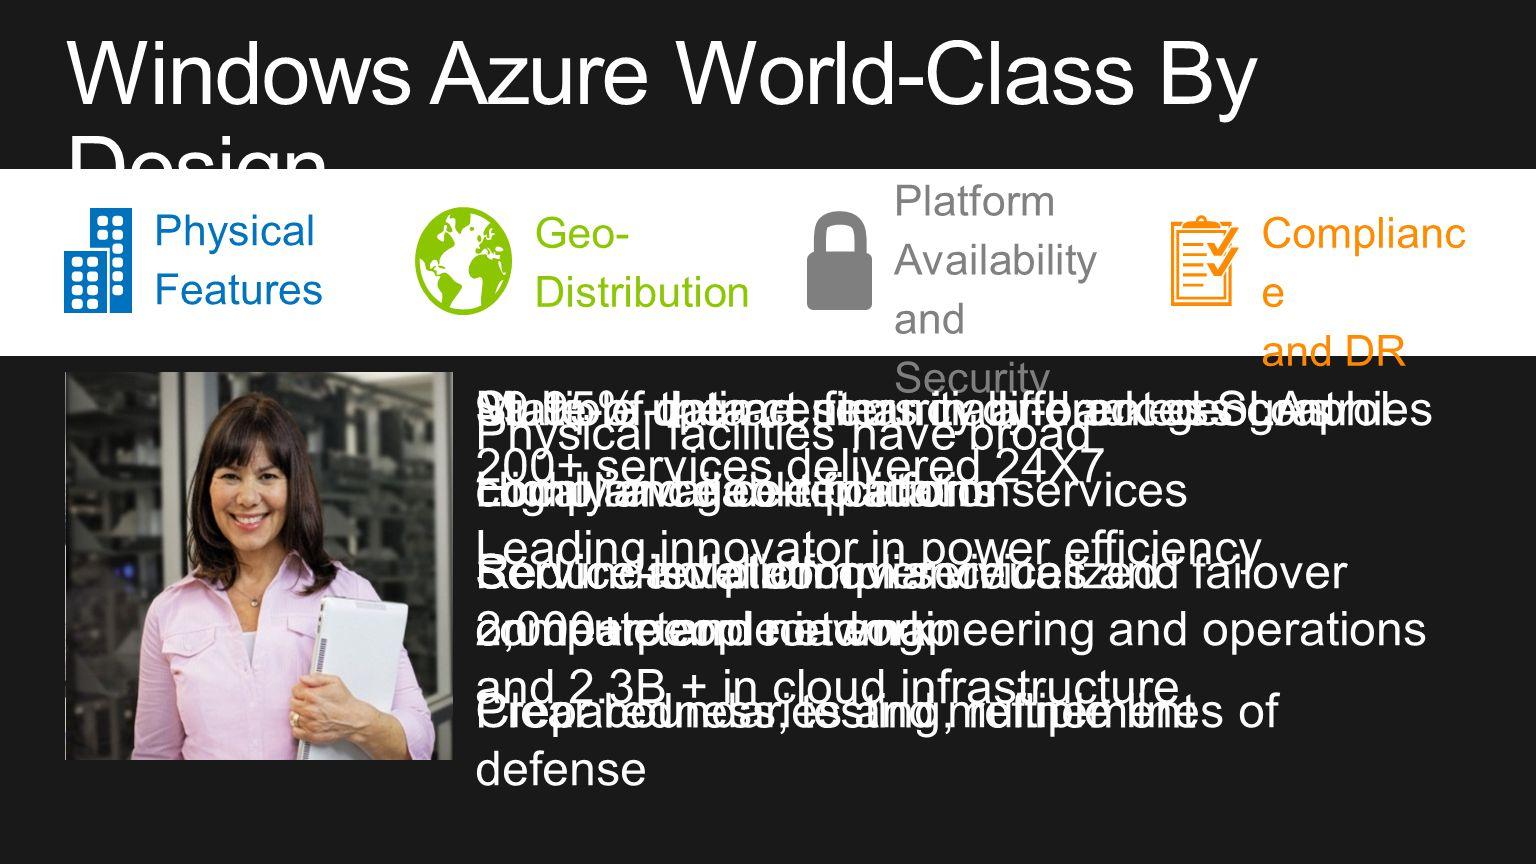 North America Region Europe RegionAsia Pacific Region Windows Azure Global Presence N.